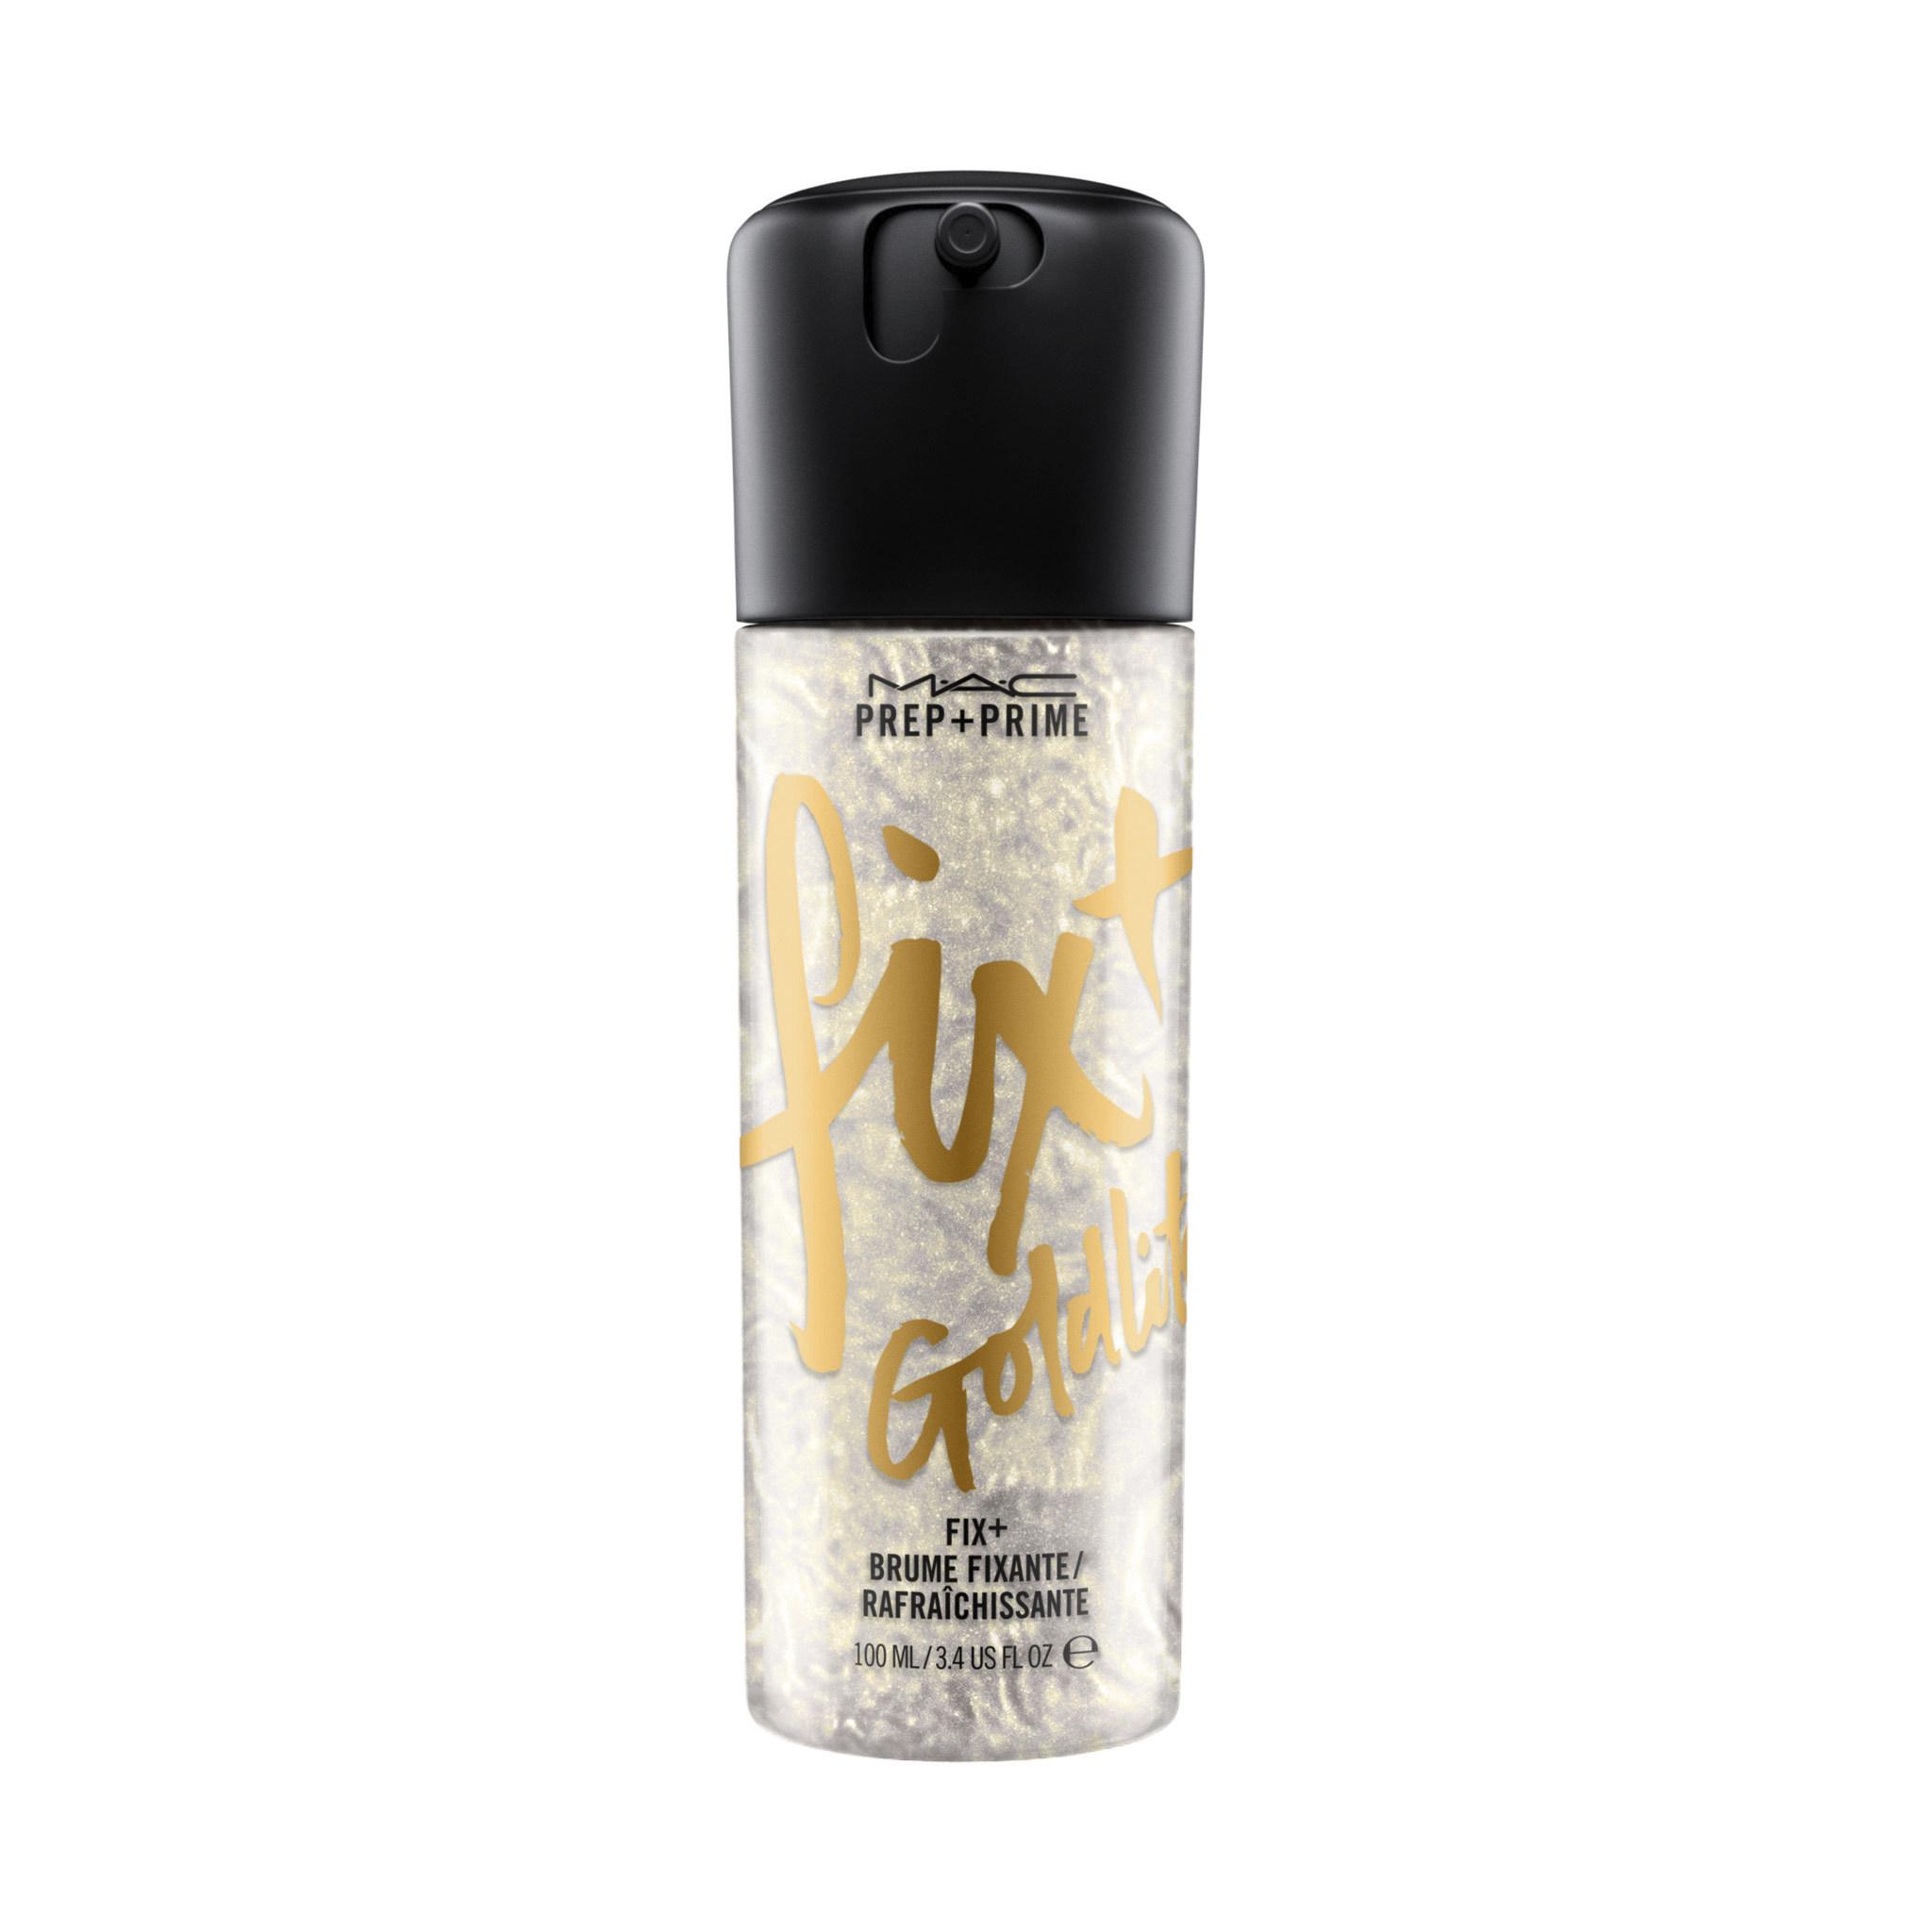 MAC Prep + Prime Fix+, goldlite, 100 ml